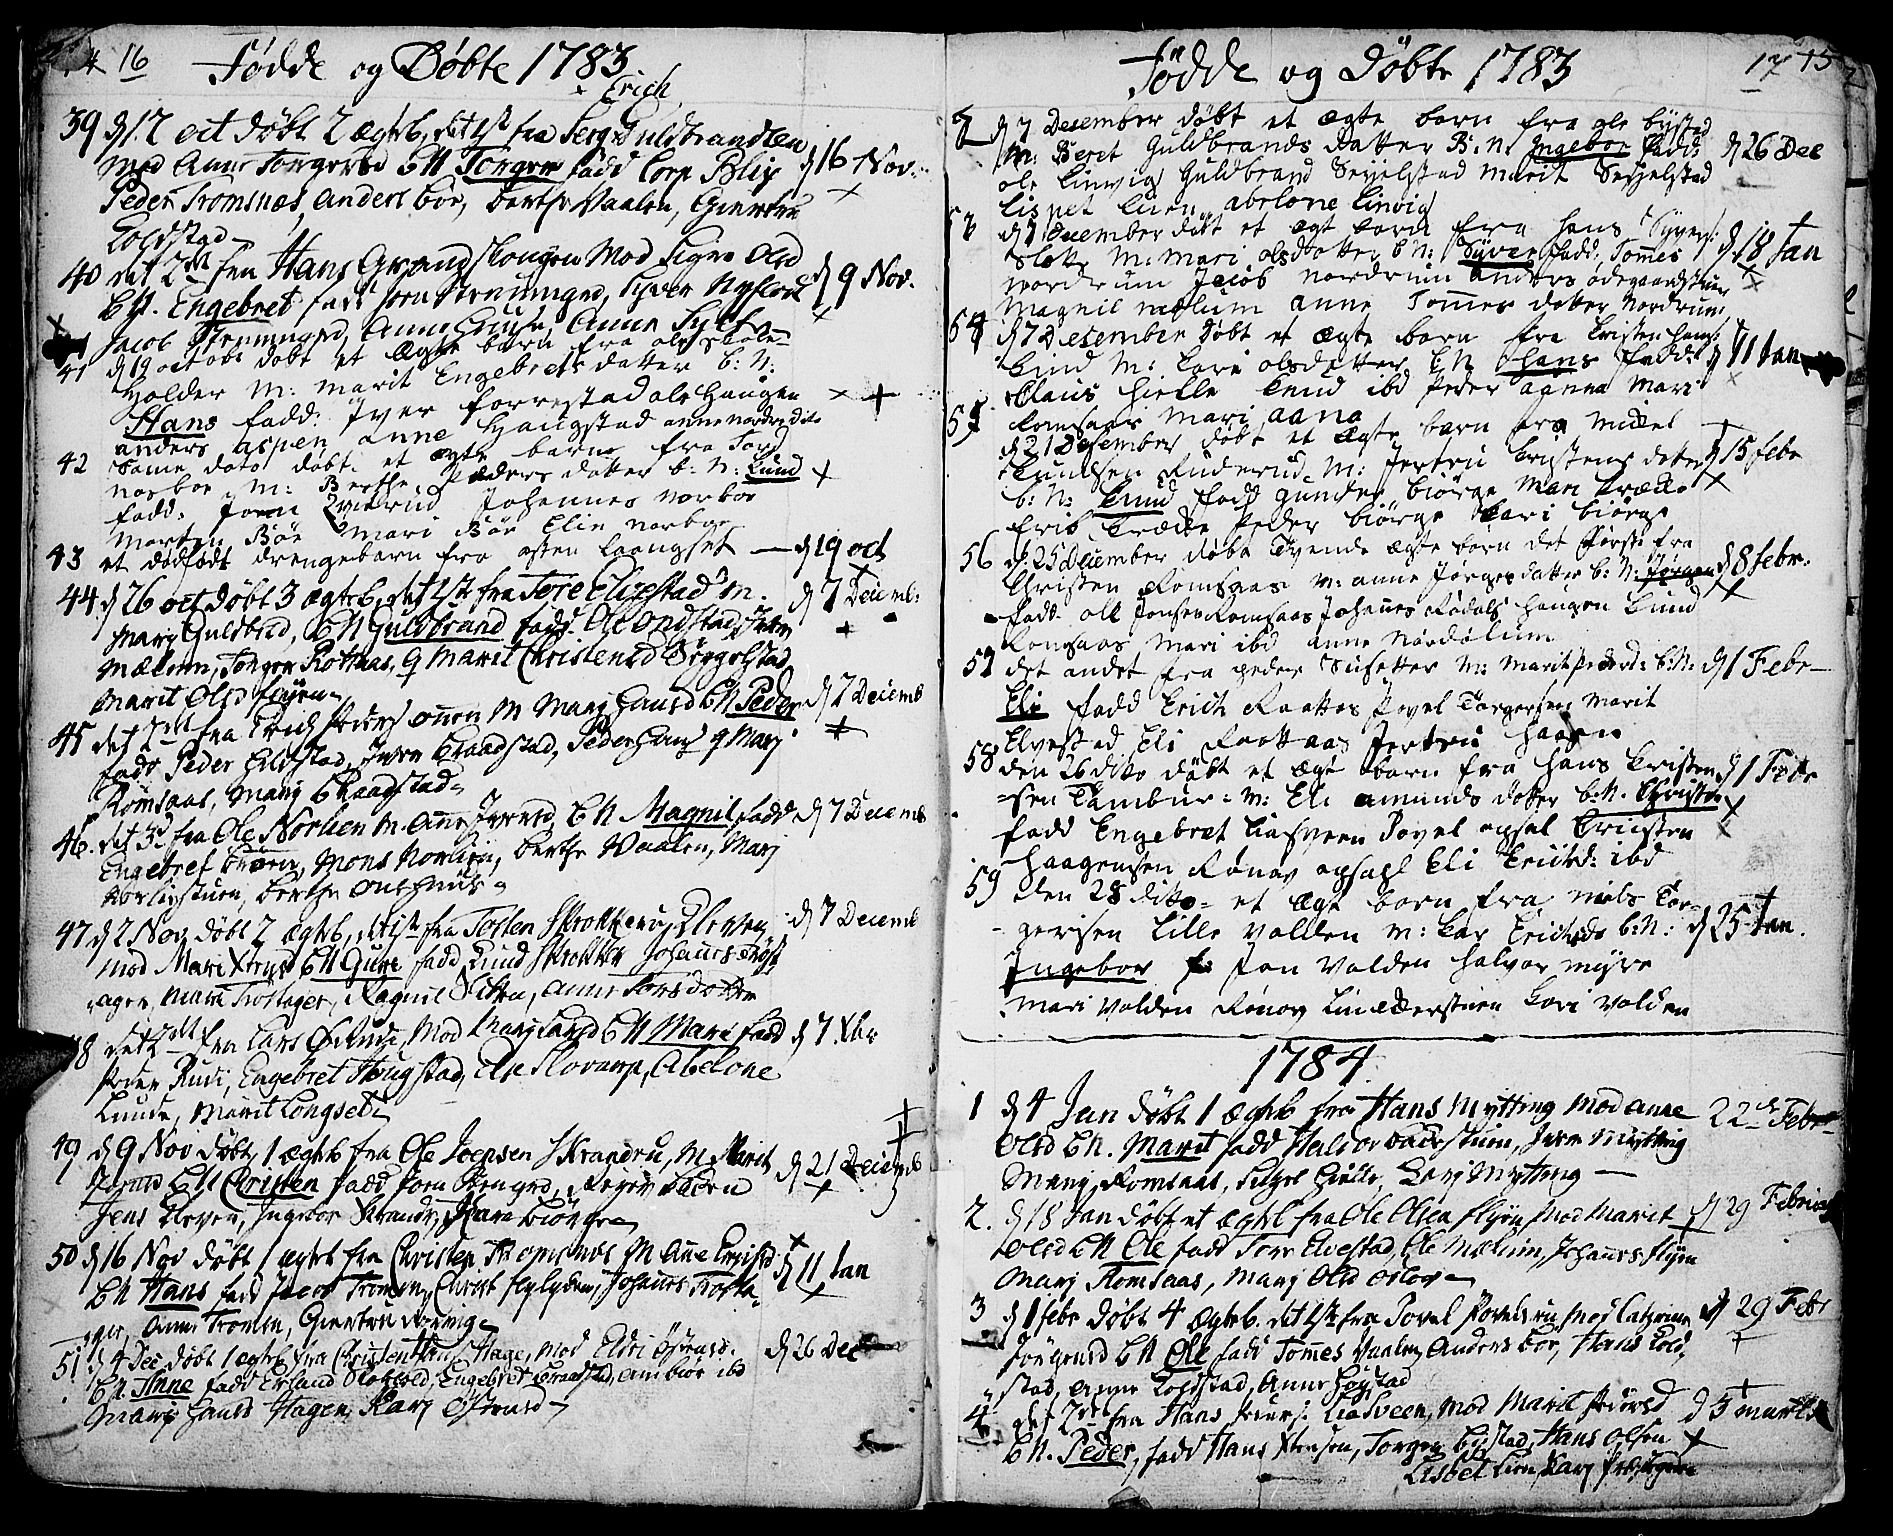 SAH, Ringebu prestekontor, Ministerialbok nr. 3, 1781-1820, s. 16-17